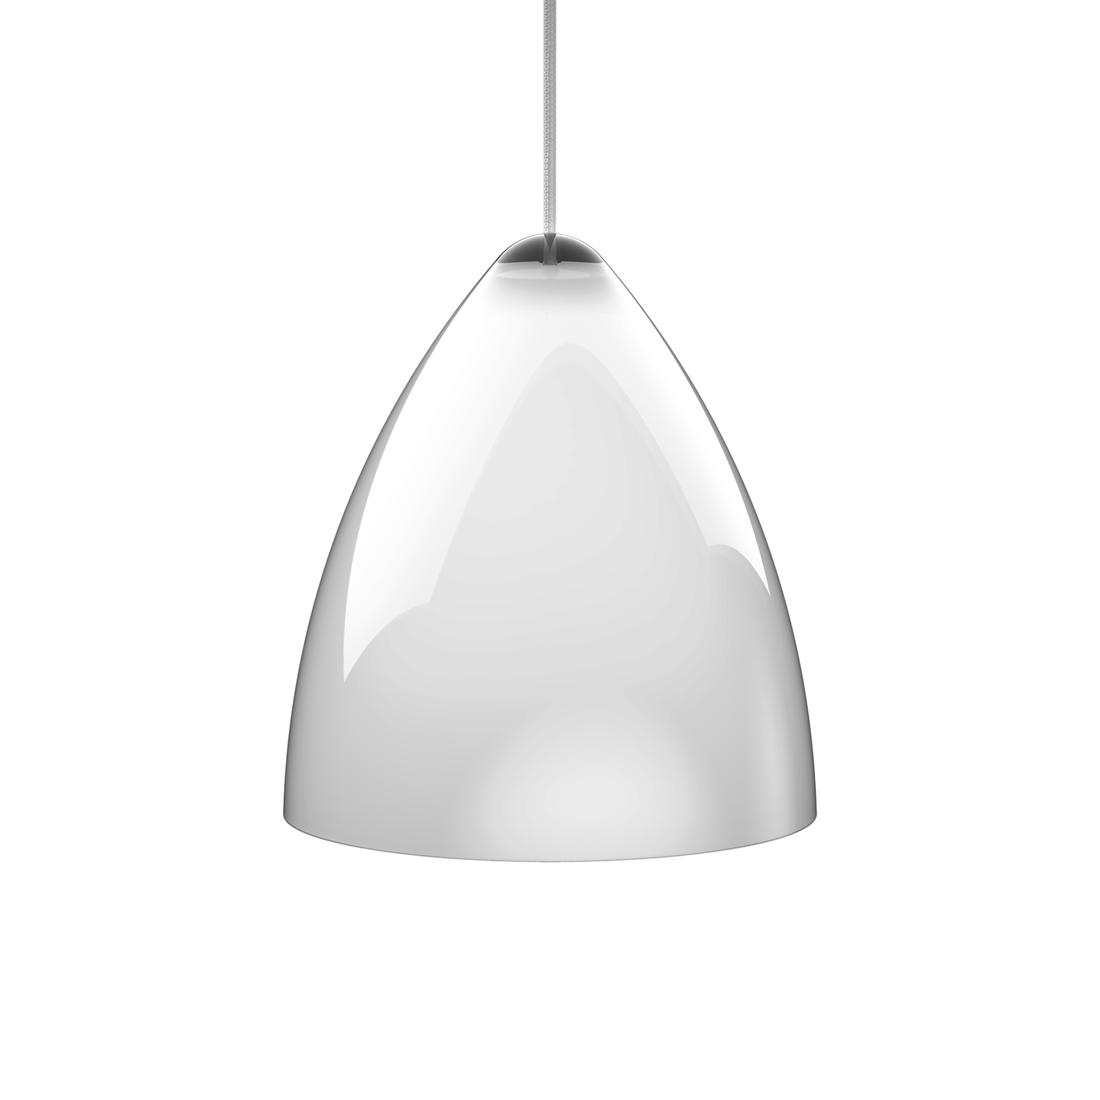 Nordlux Hanglamp Funk - plexiglas/textiel - wit/wit (Diameter 27cm) Home24